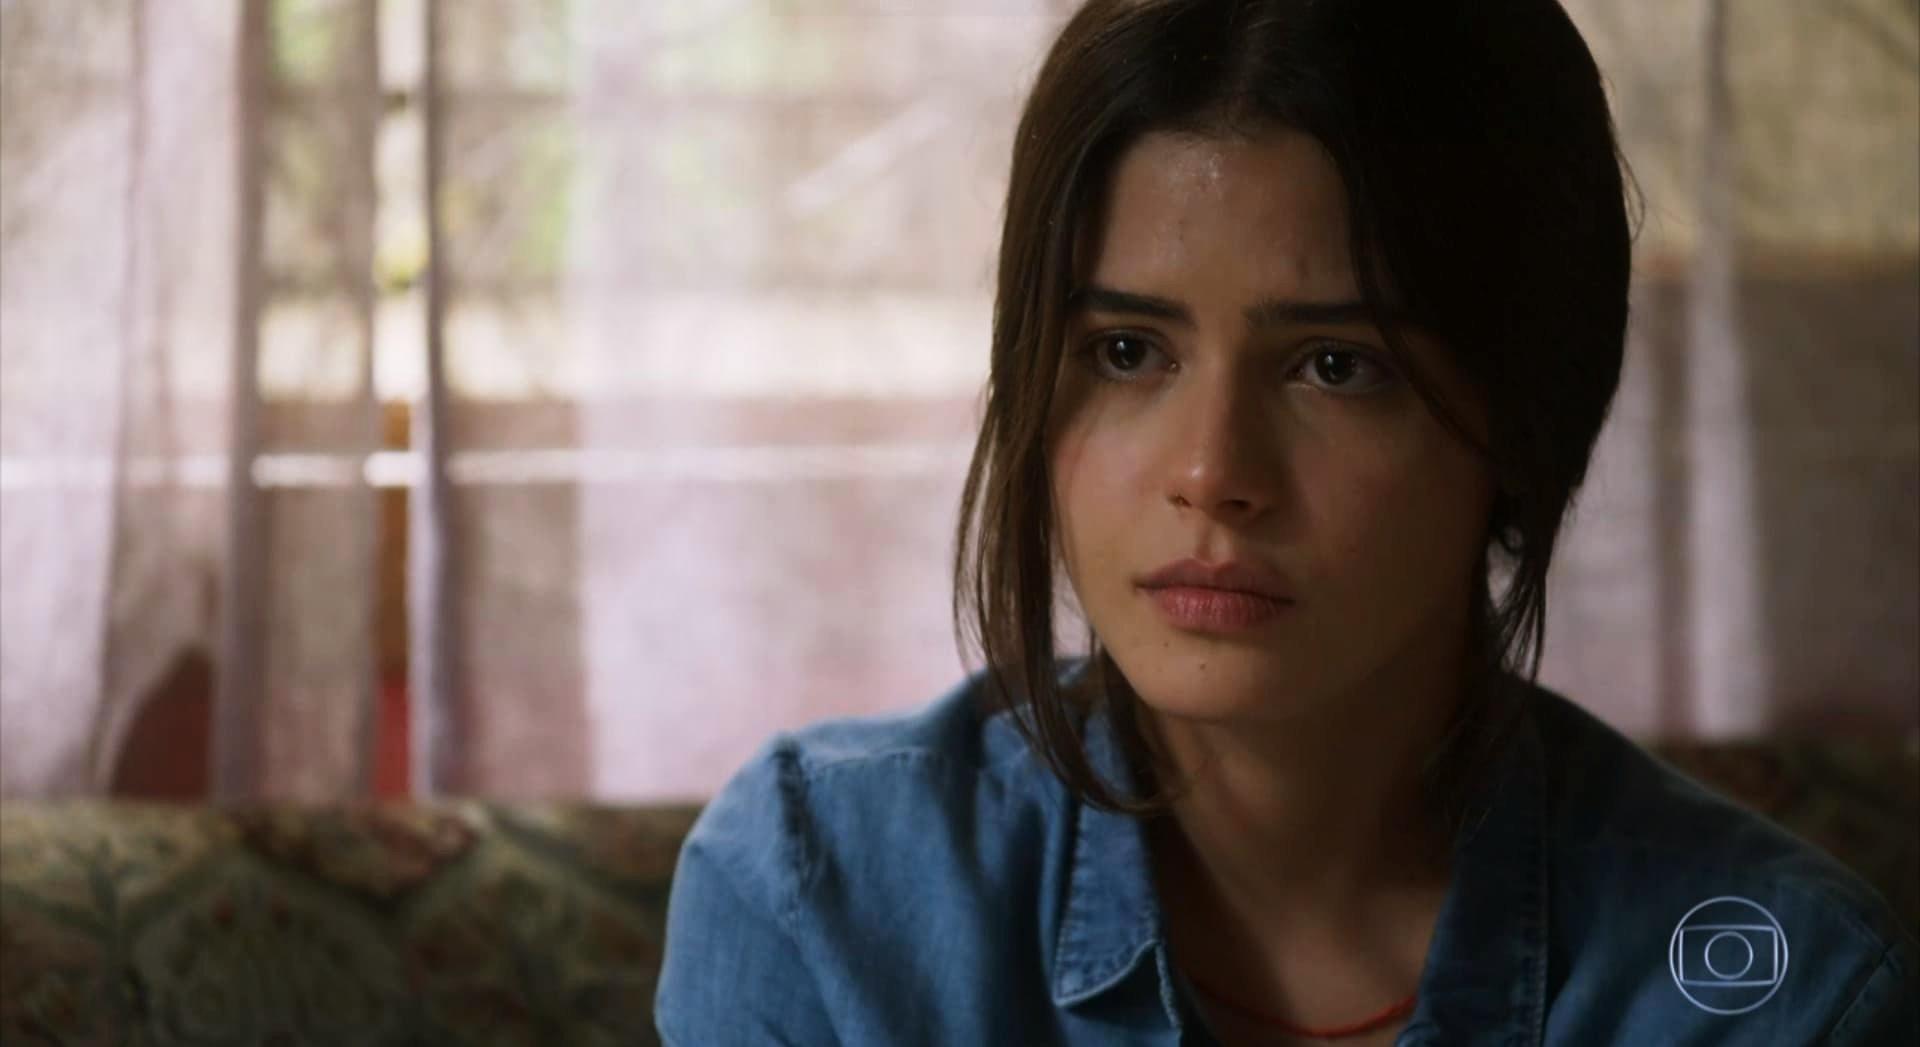 Julia Dalavia é a intérprete da mocinha Laila da novela da Globo Órfãos da Terra